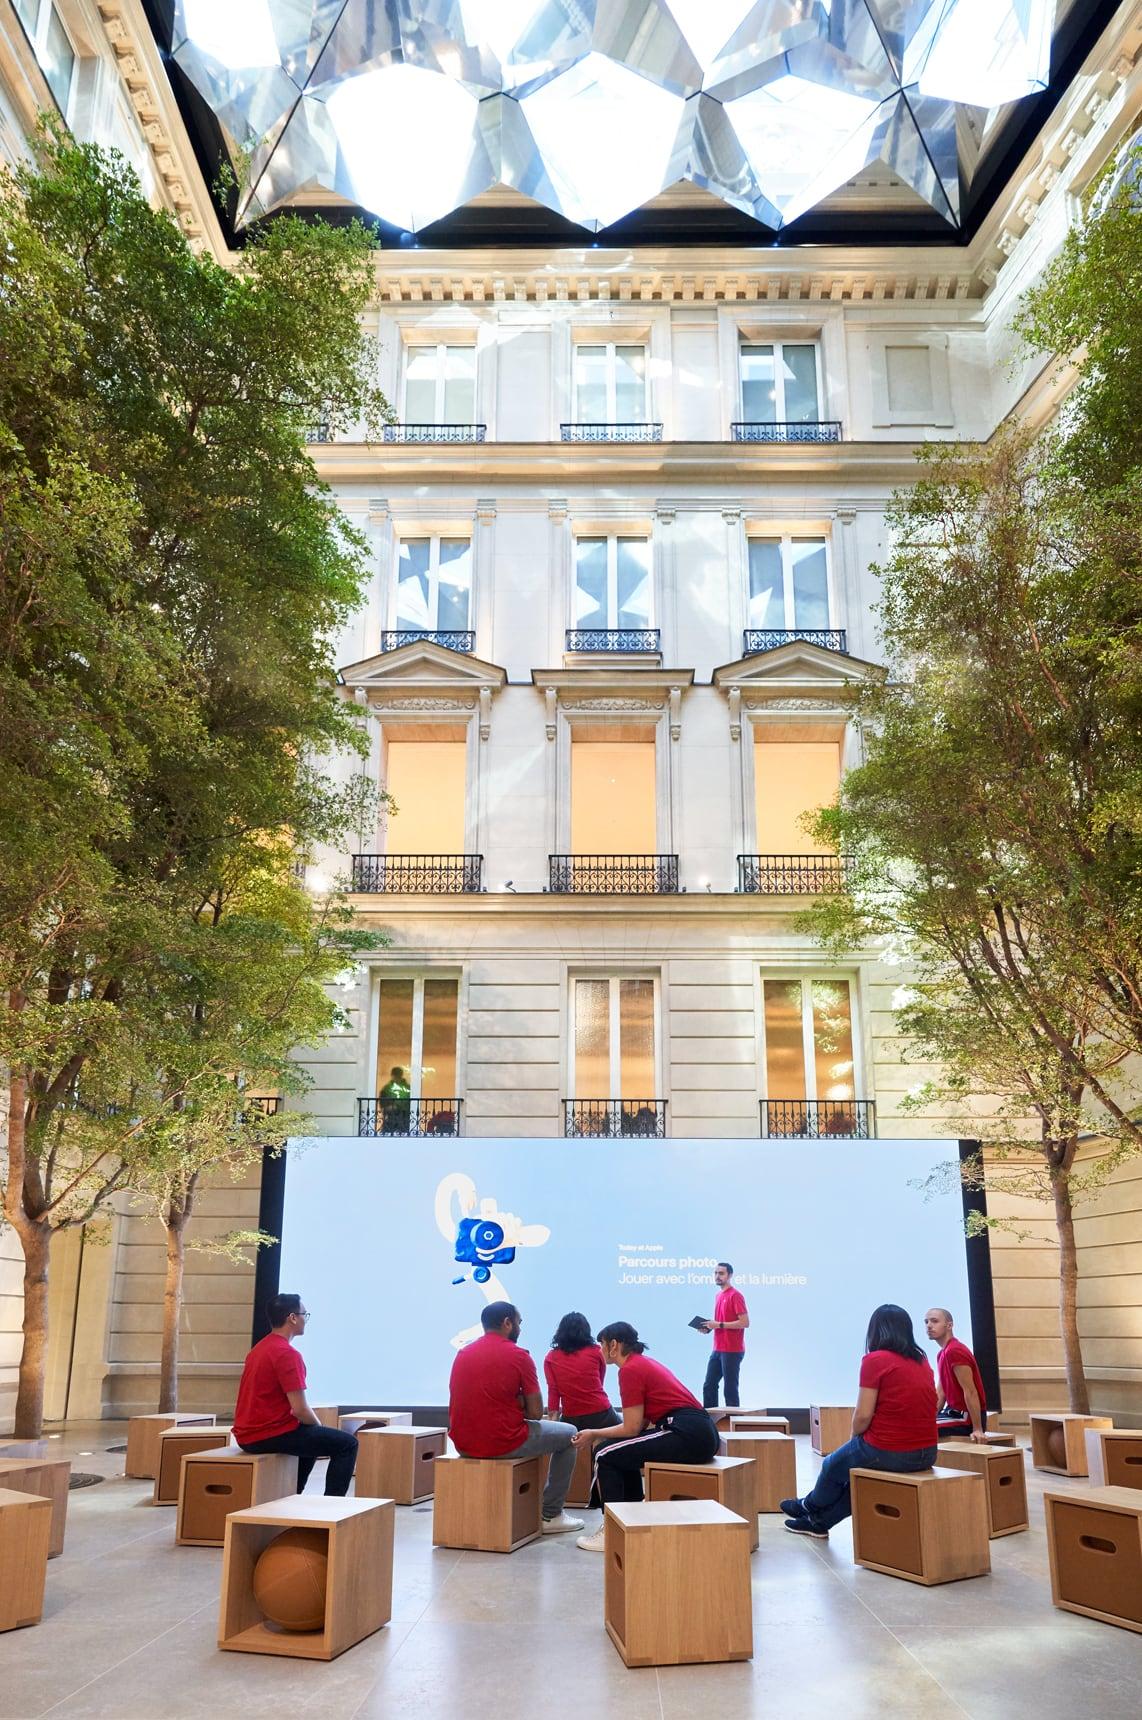 Apple Store Champs-Élysées binnen